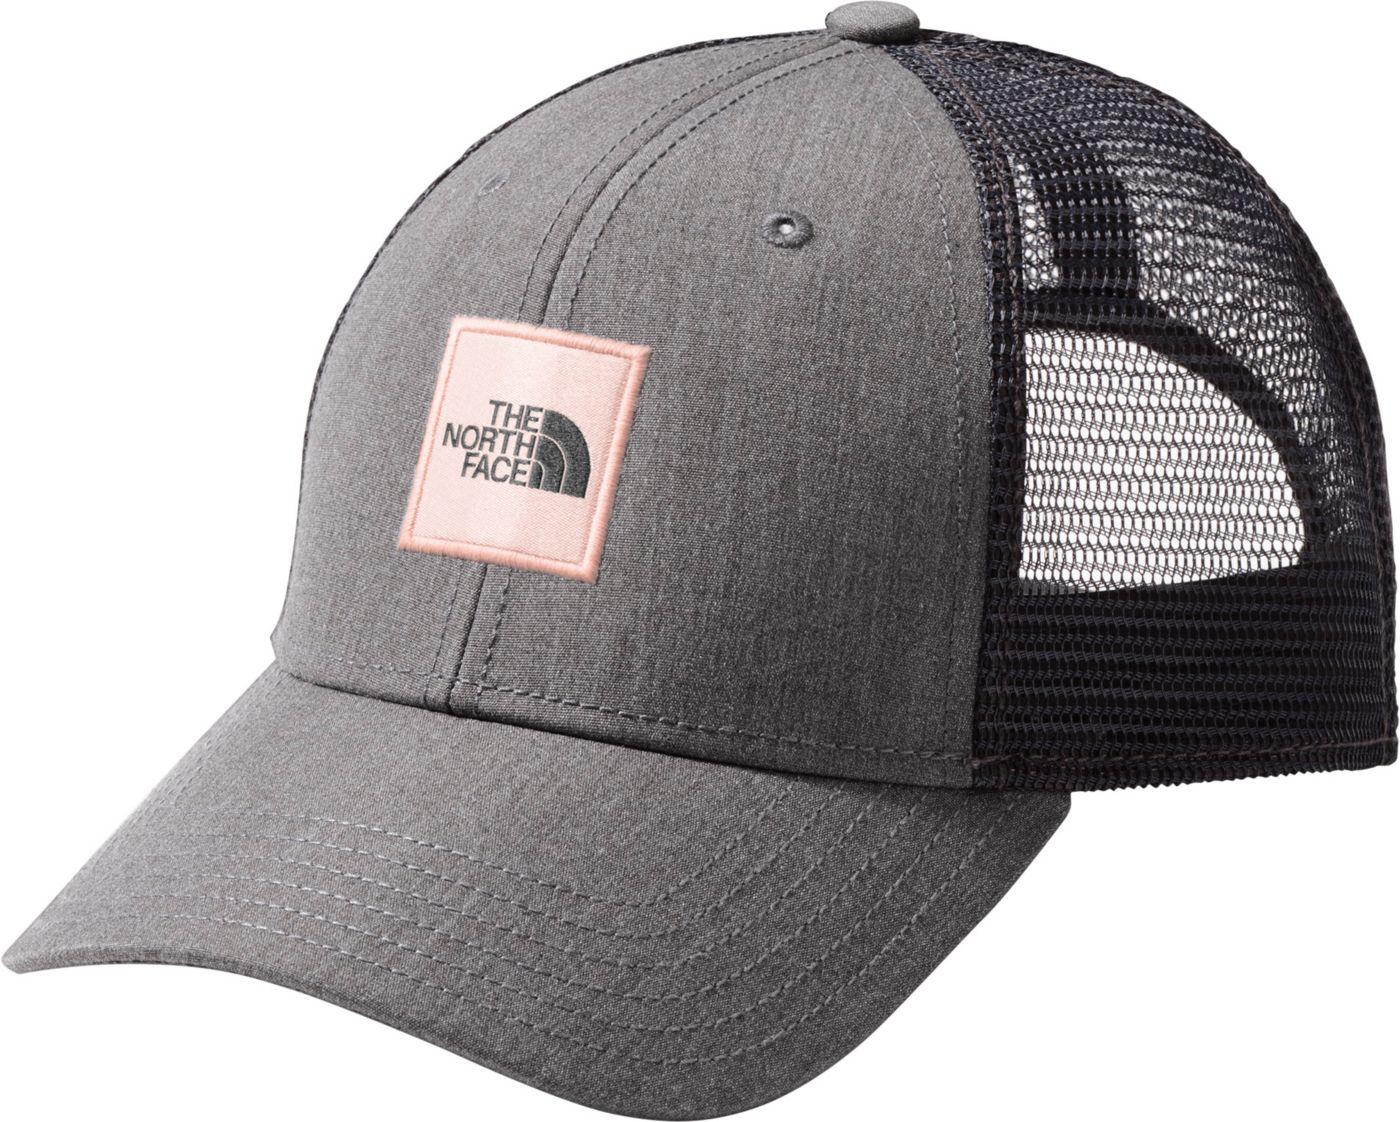 The North Face Women's Box Logo Trucker Hat